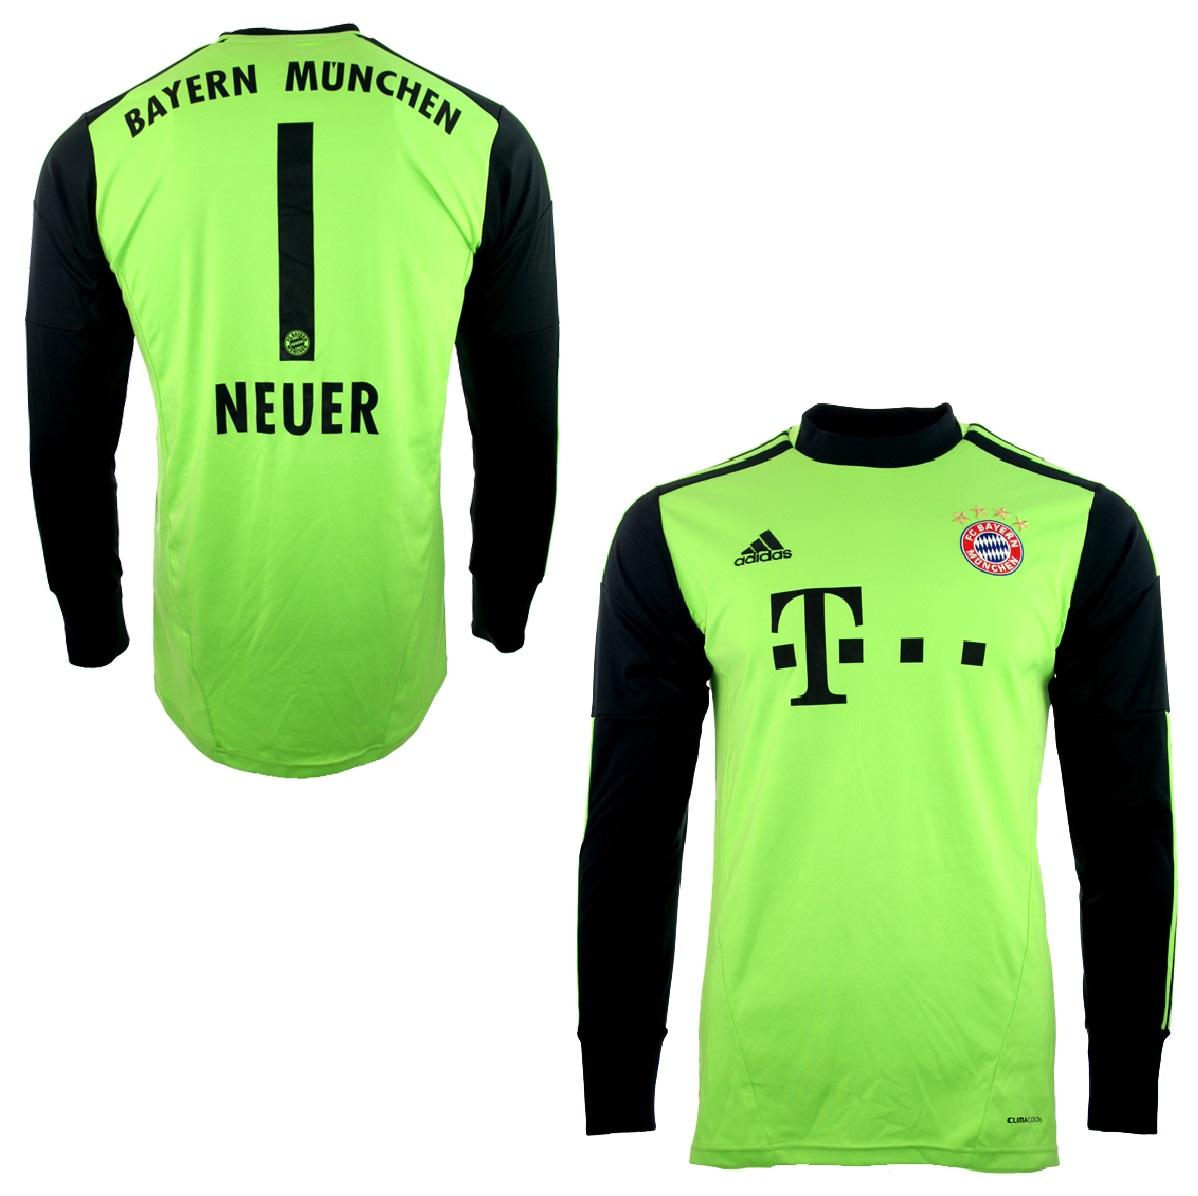 97cc789b2db84a Adidas FC Bayern München Torwart Trikot 1 Manuel Neuer 2012 13 Triple  Herren M oder XL